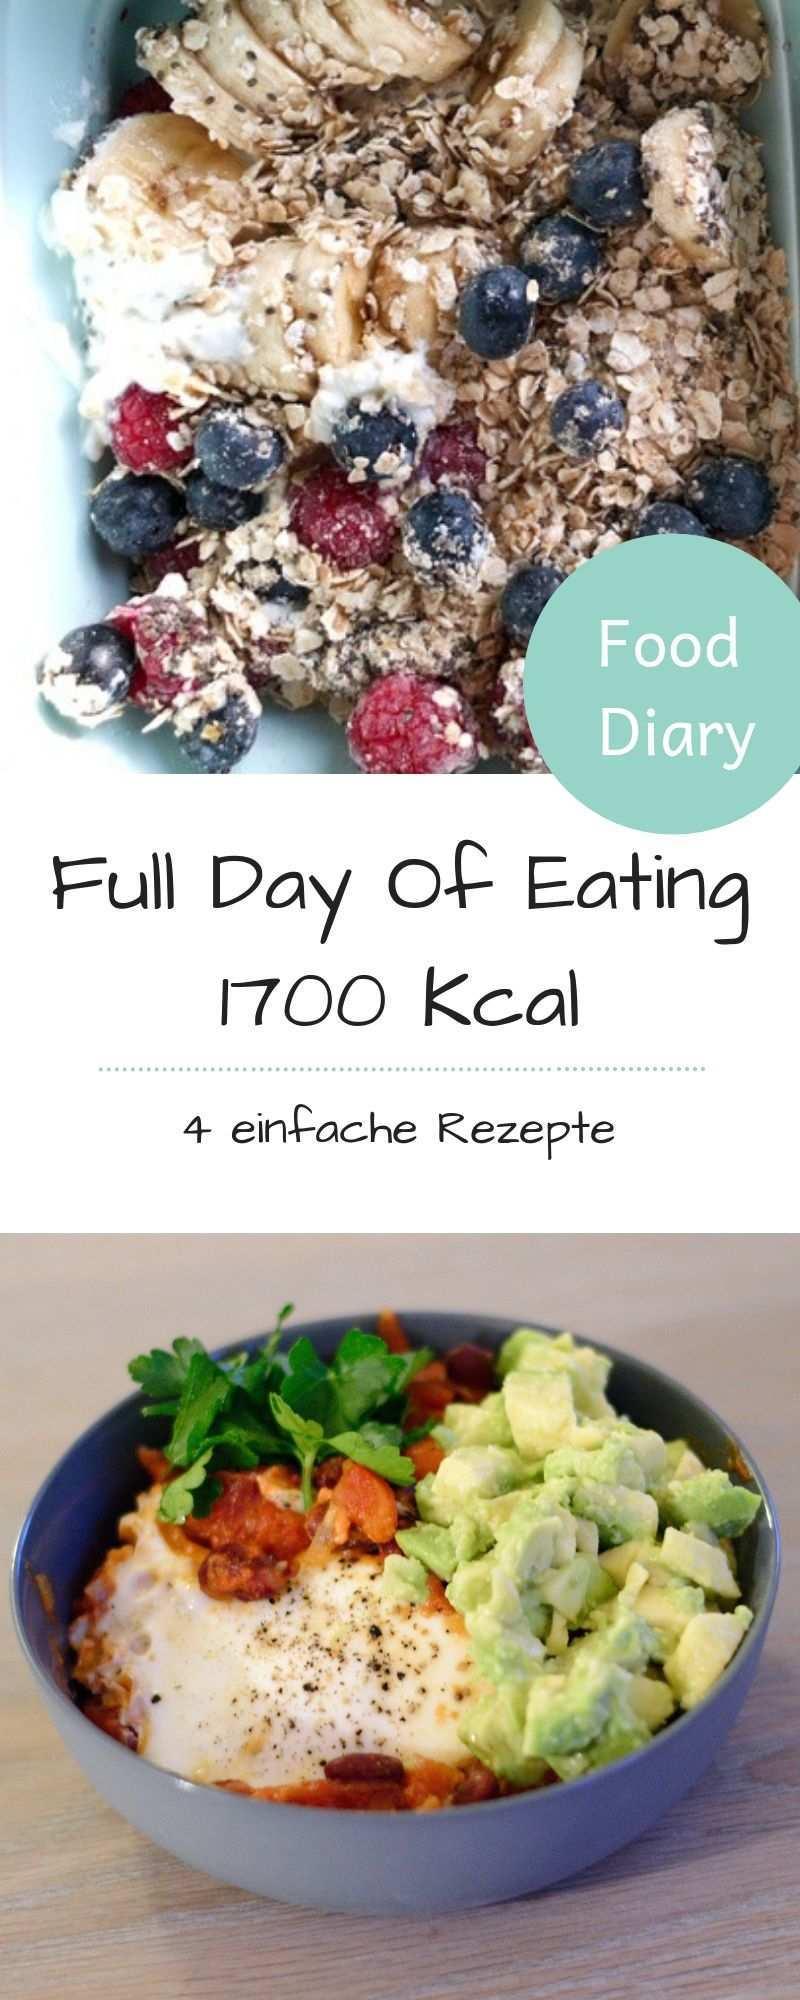 Gesunde Ernahrung Tagesplan Rezept Gesunde Ernahrung Ernahrung Gesunde Mahlzeiten